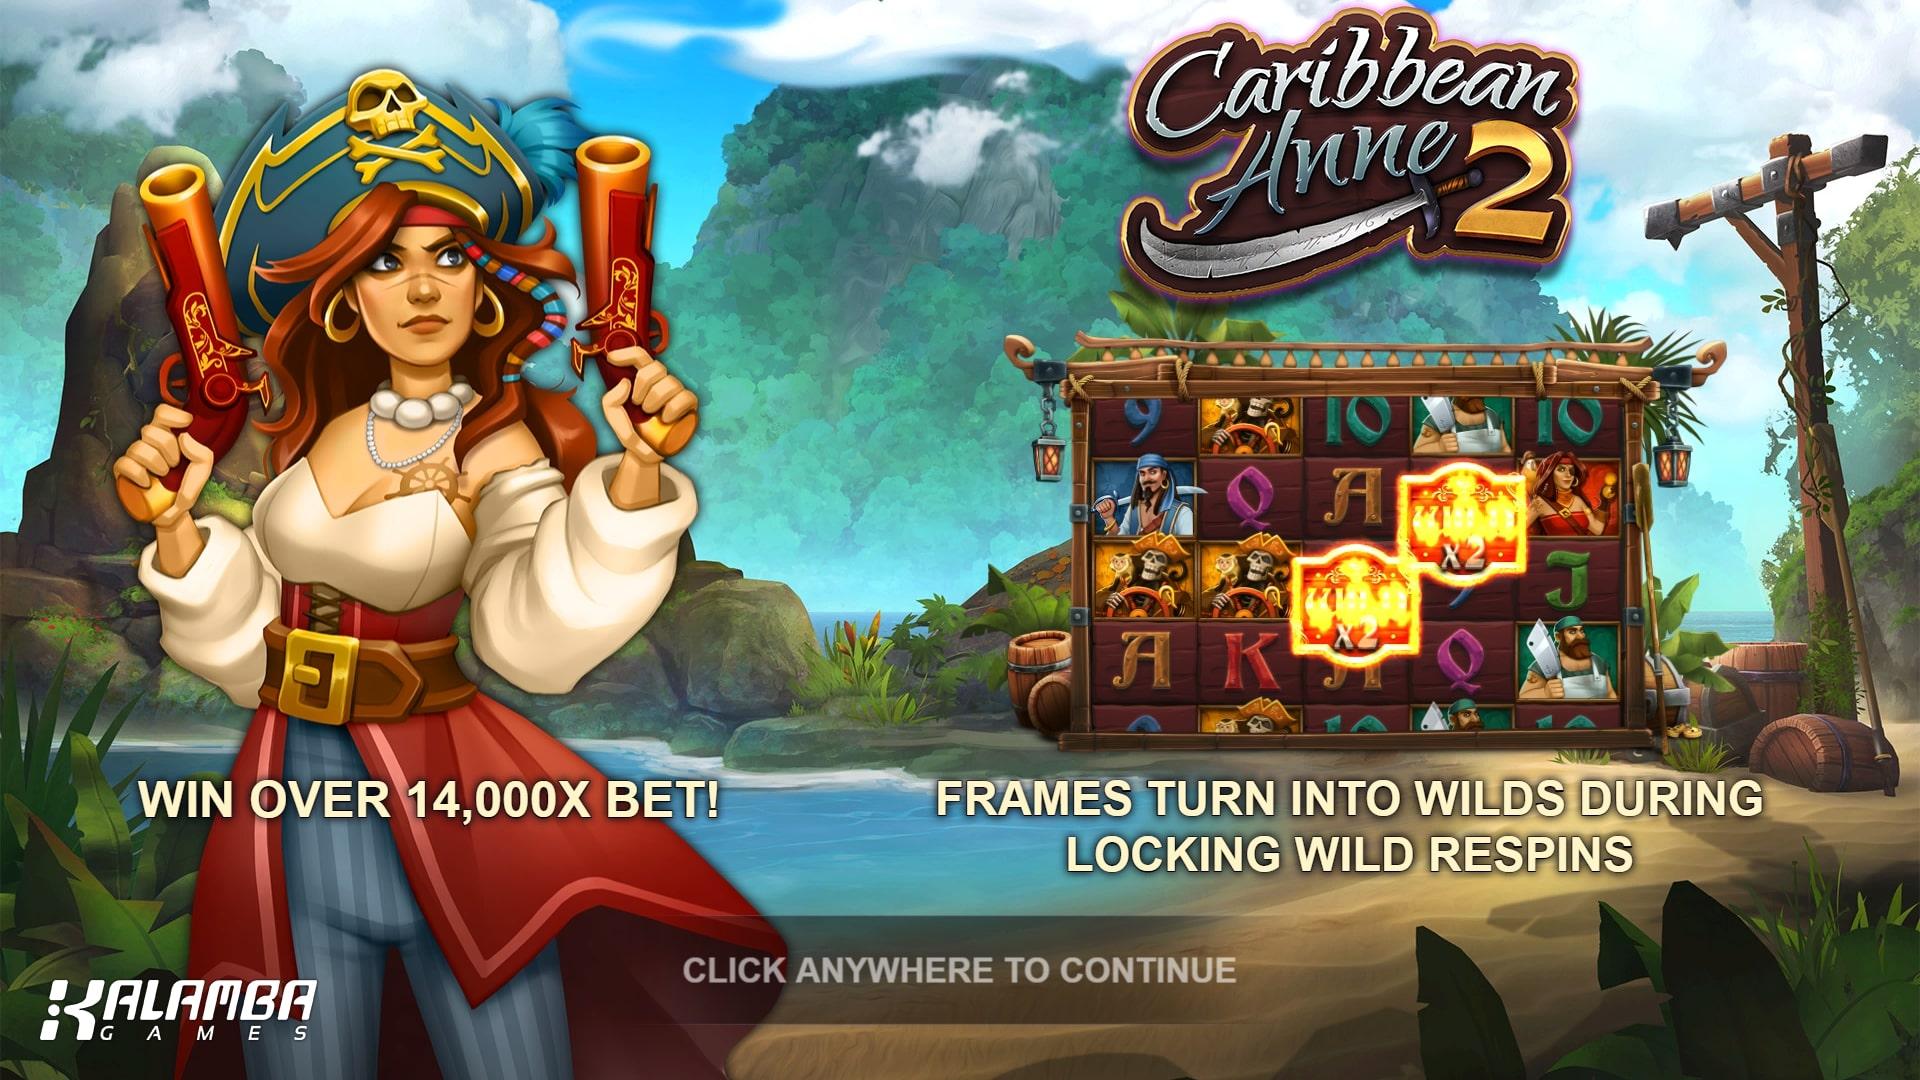 Caribbean Anne 2 Screenshot